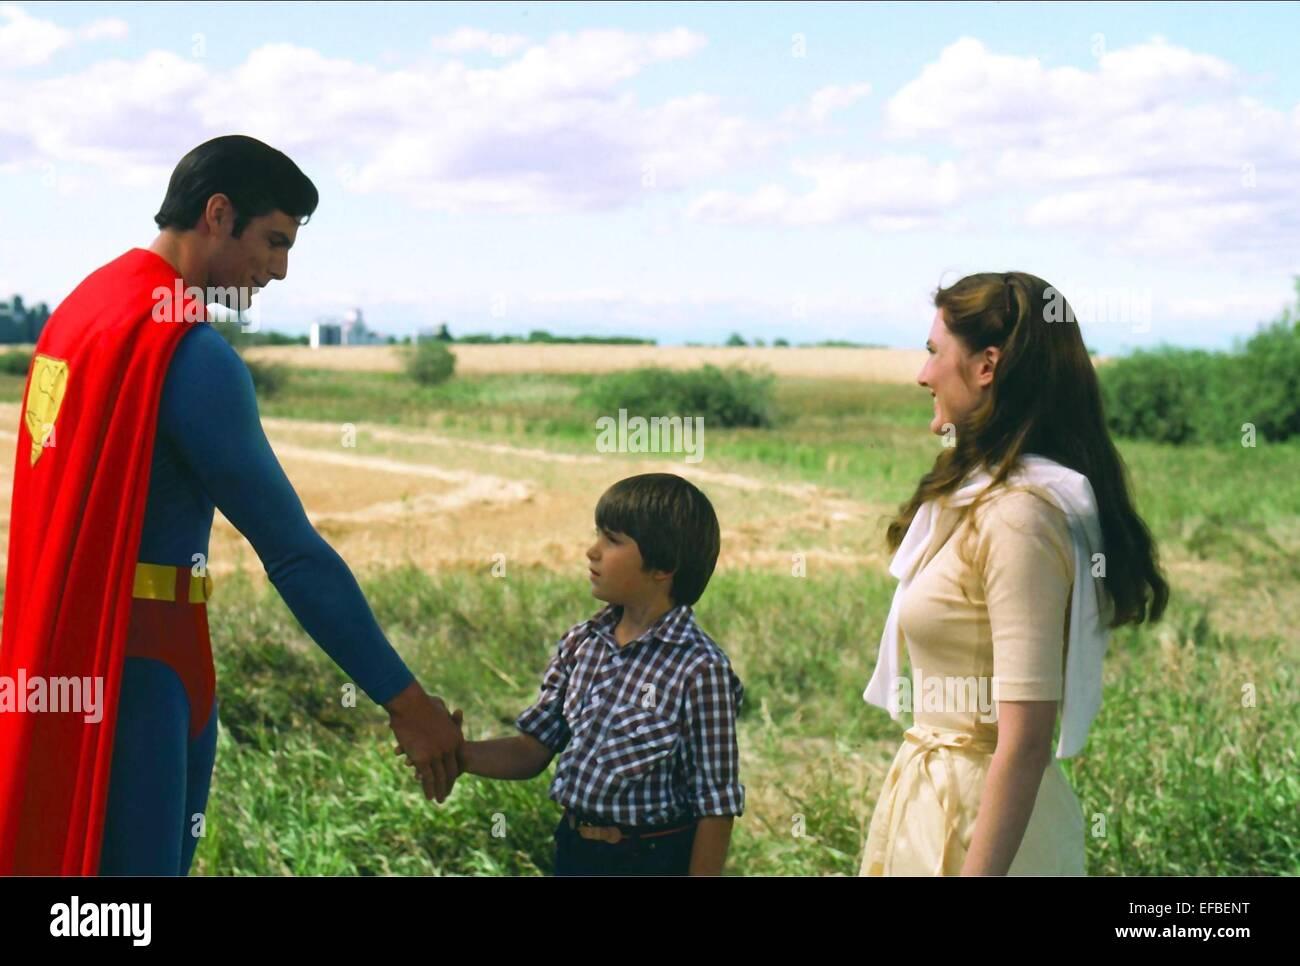 CHRISTOPHER REEVE, PAUL KAETHLER, ANNETTE O'TOOLE, SUPERMAN III, 1983 Stock Photo